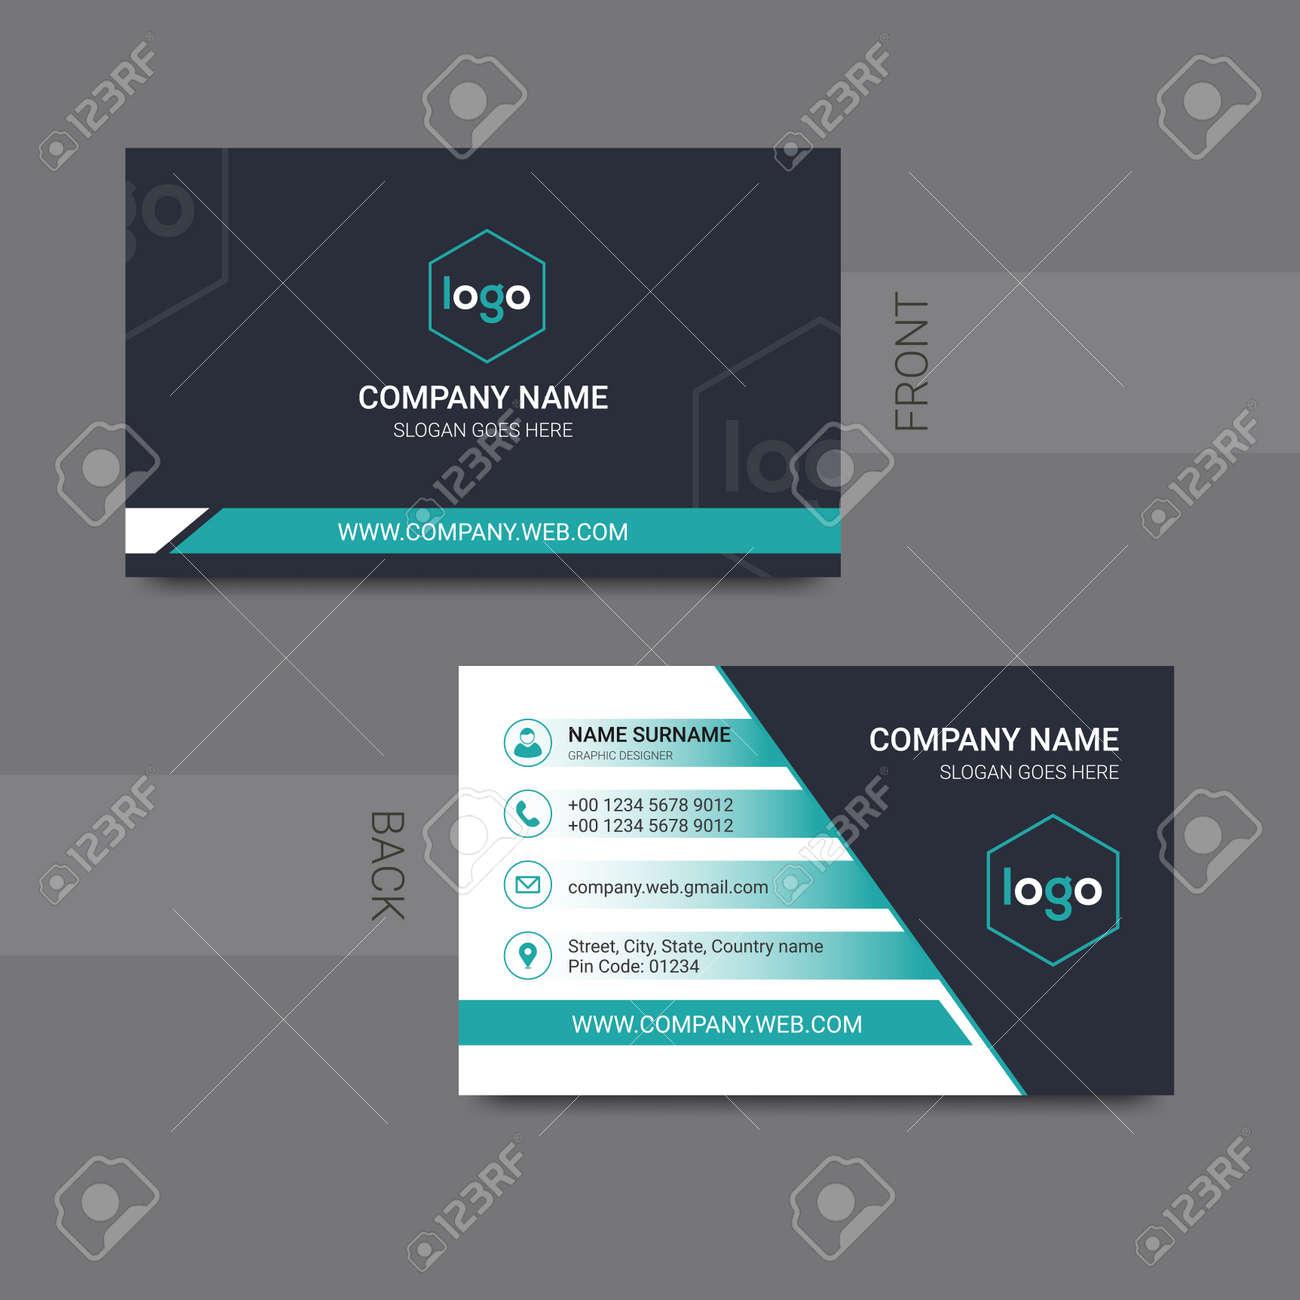 Modern professional business card design vector. Vector illustration. - 168074122